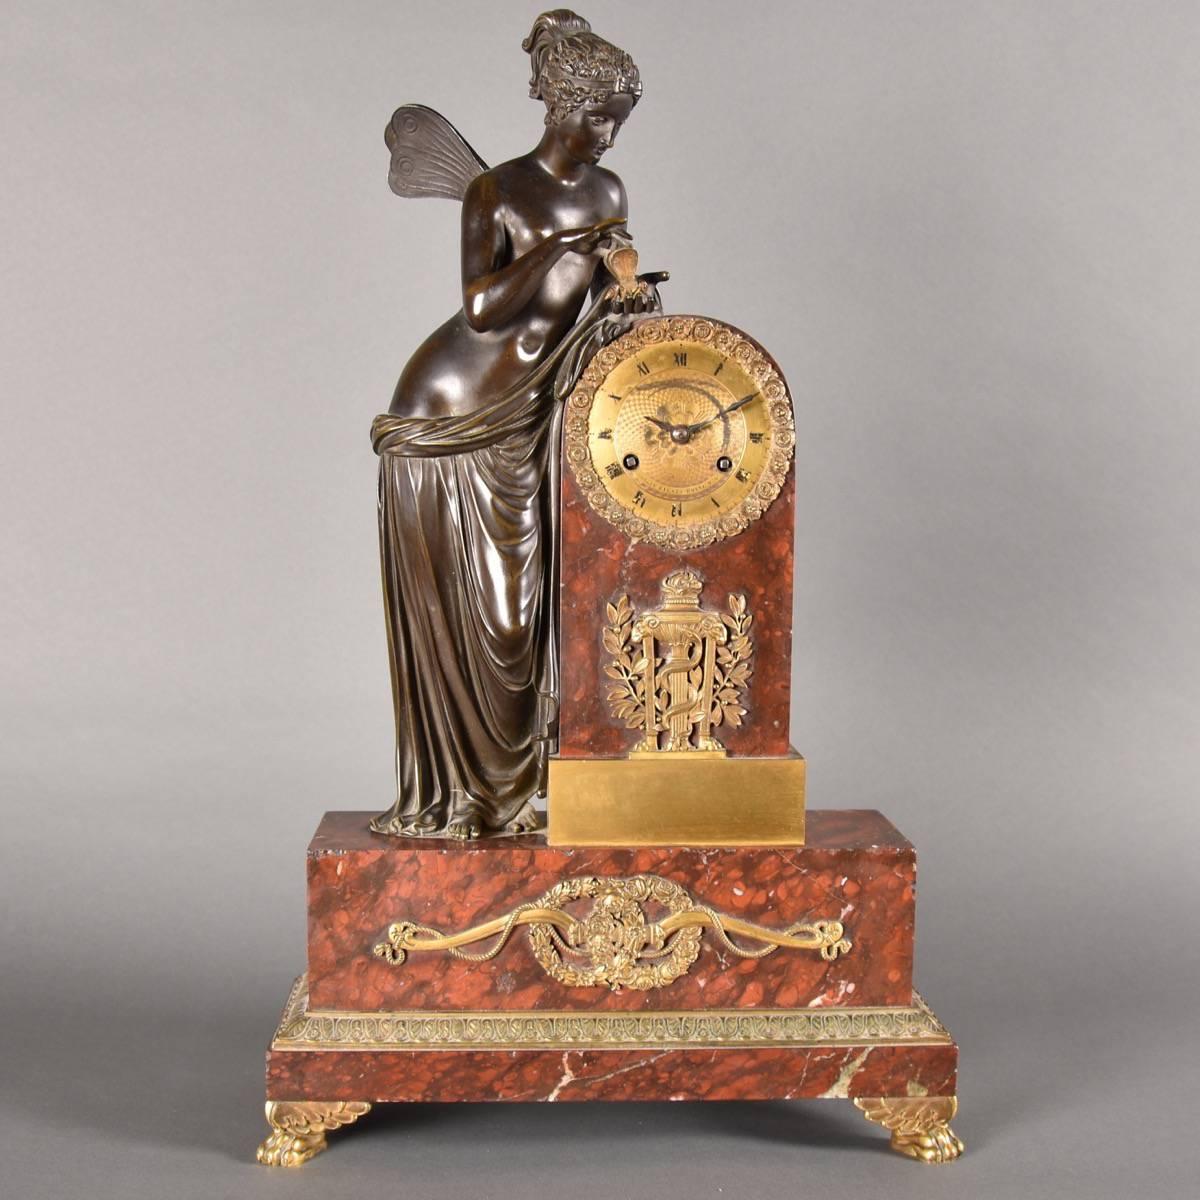 French Marble Mantel Clock With Bronze Figure De Grande